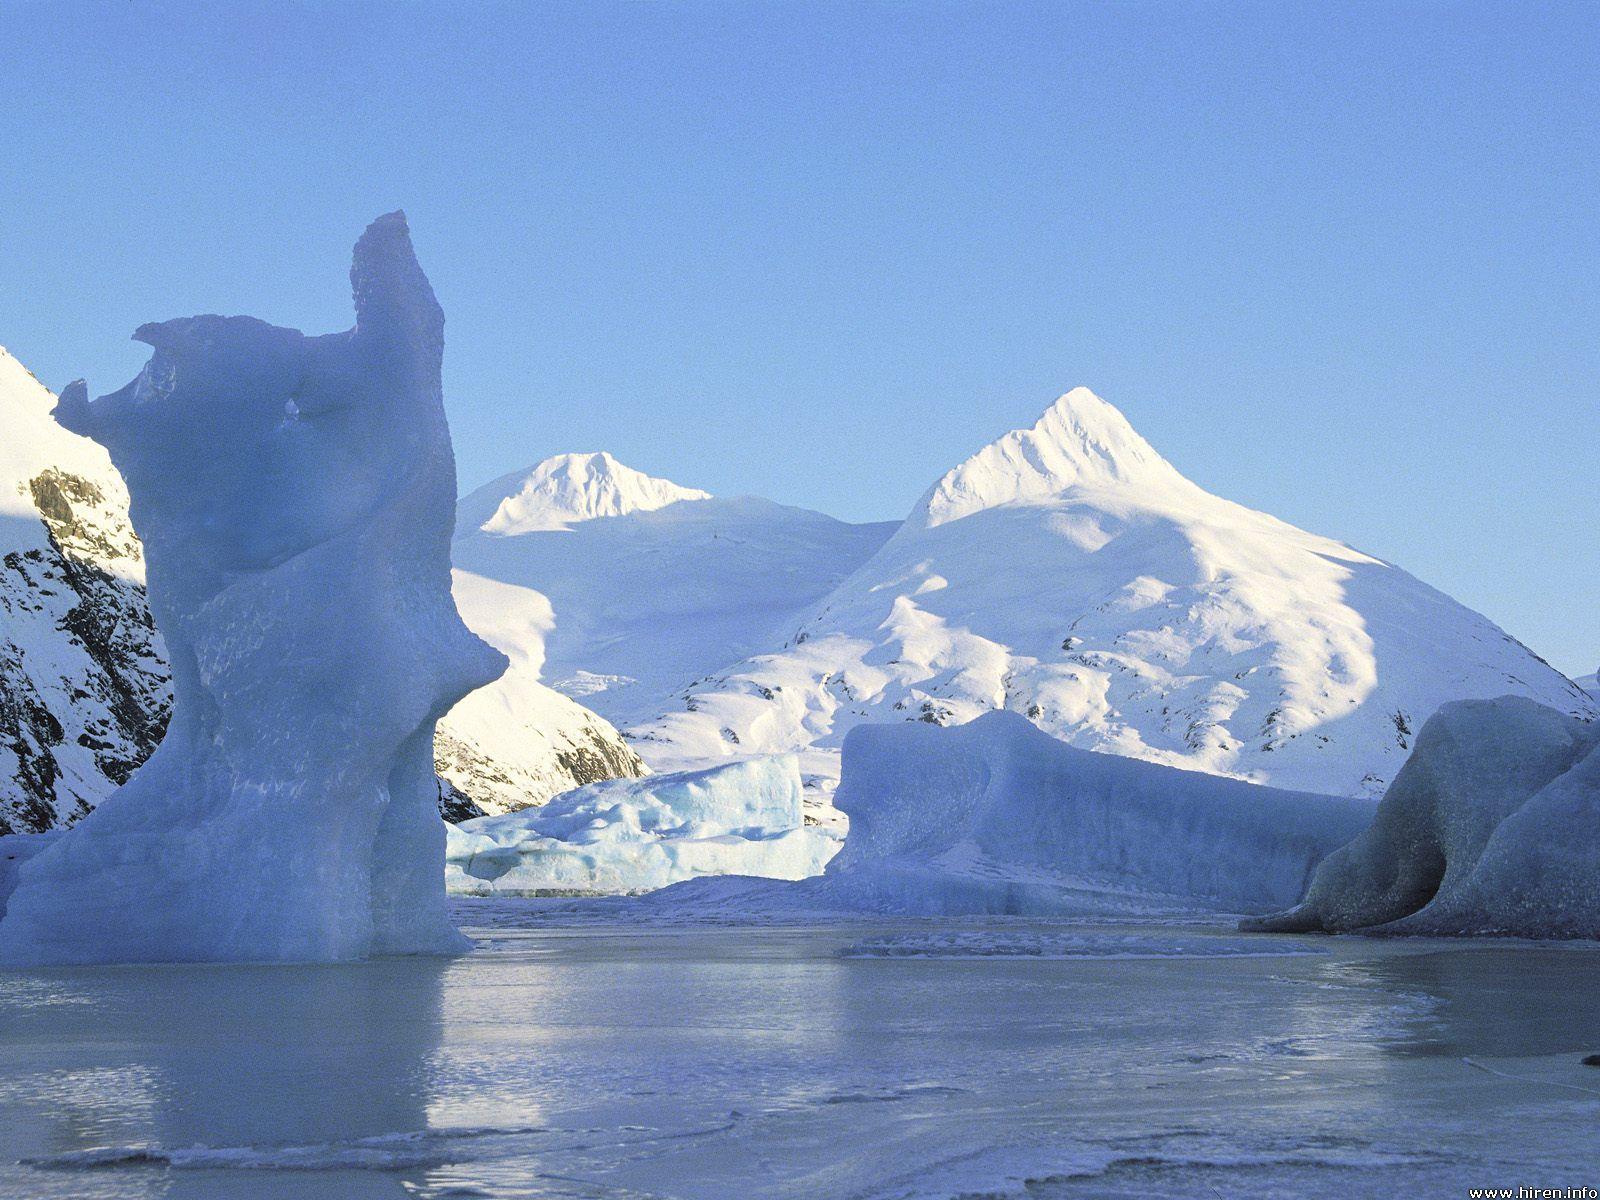 Icebergs Portage Glacier Alaska Alaska Glaciers Alaska Scenery 2085 users has viewed and downloaded this wallpaper. pinterest